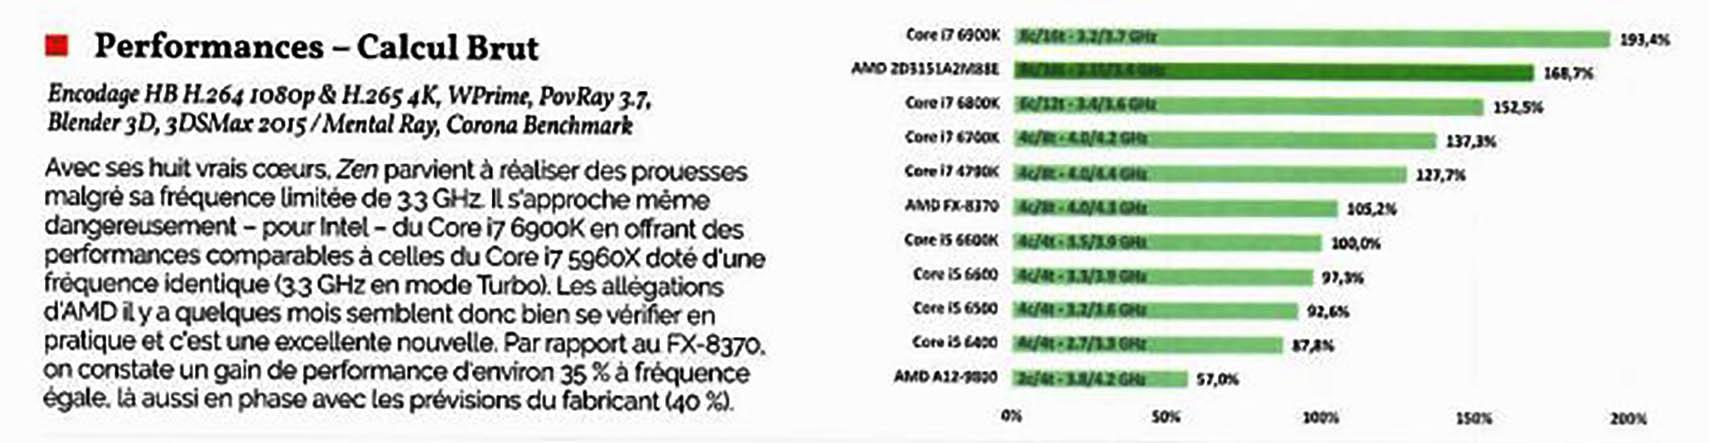 AMD Ryzen CPU benchmarks emerge | OC3D News